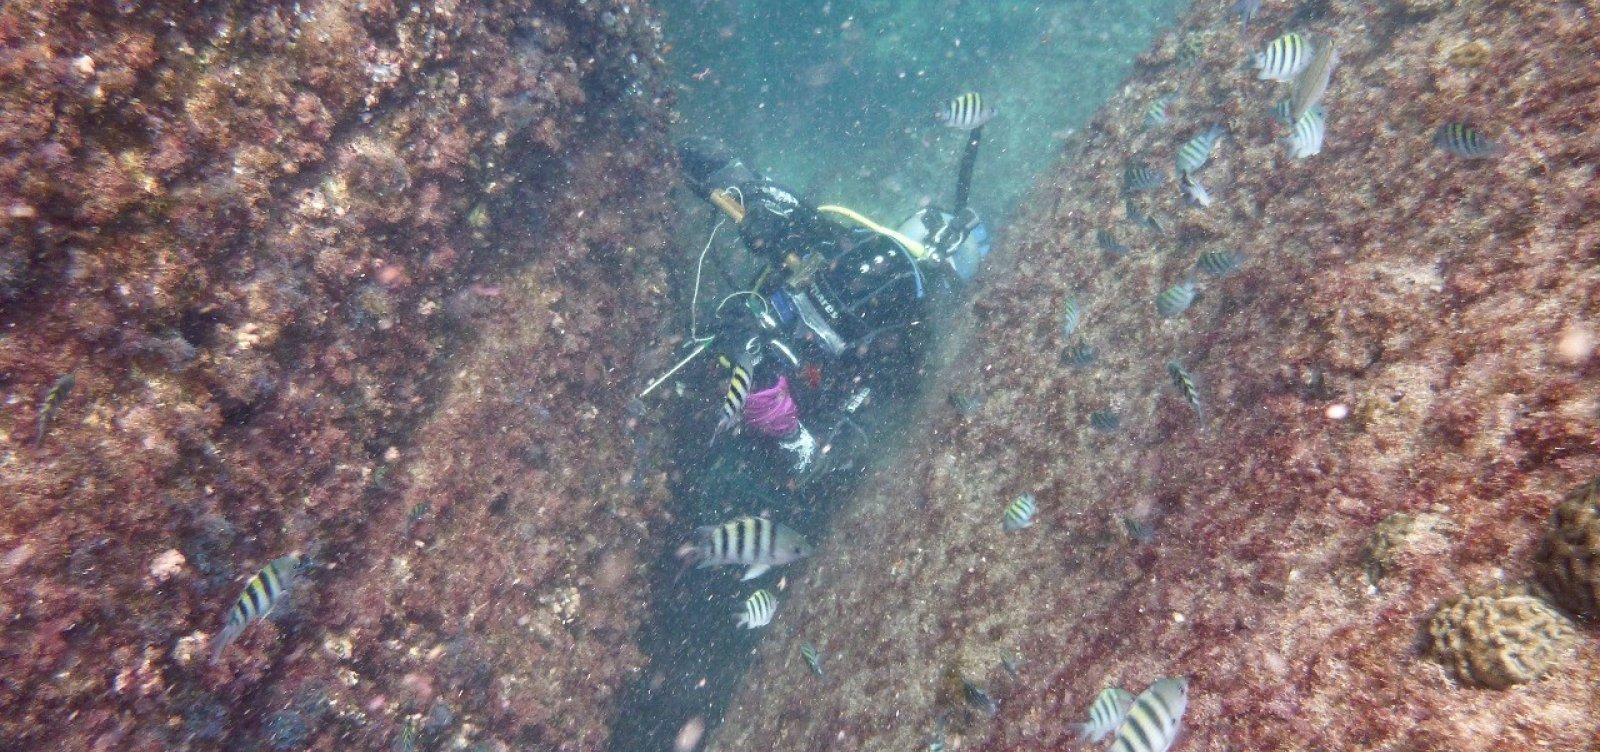 [MPF investiga crime ambiental após fundeio de plataforma na Baía de Todos-os-Santos]